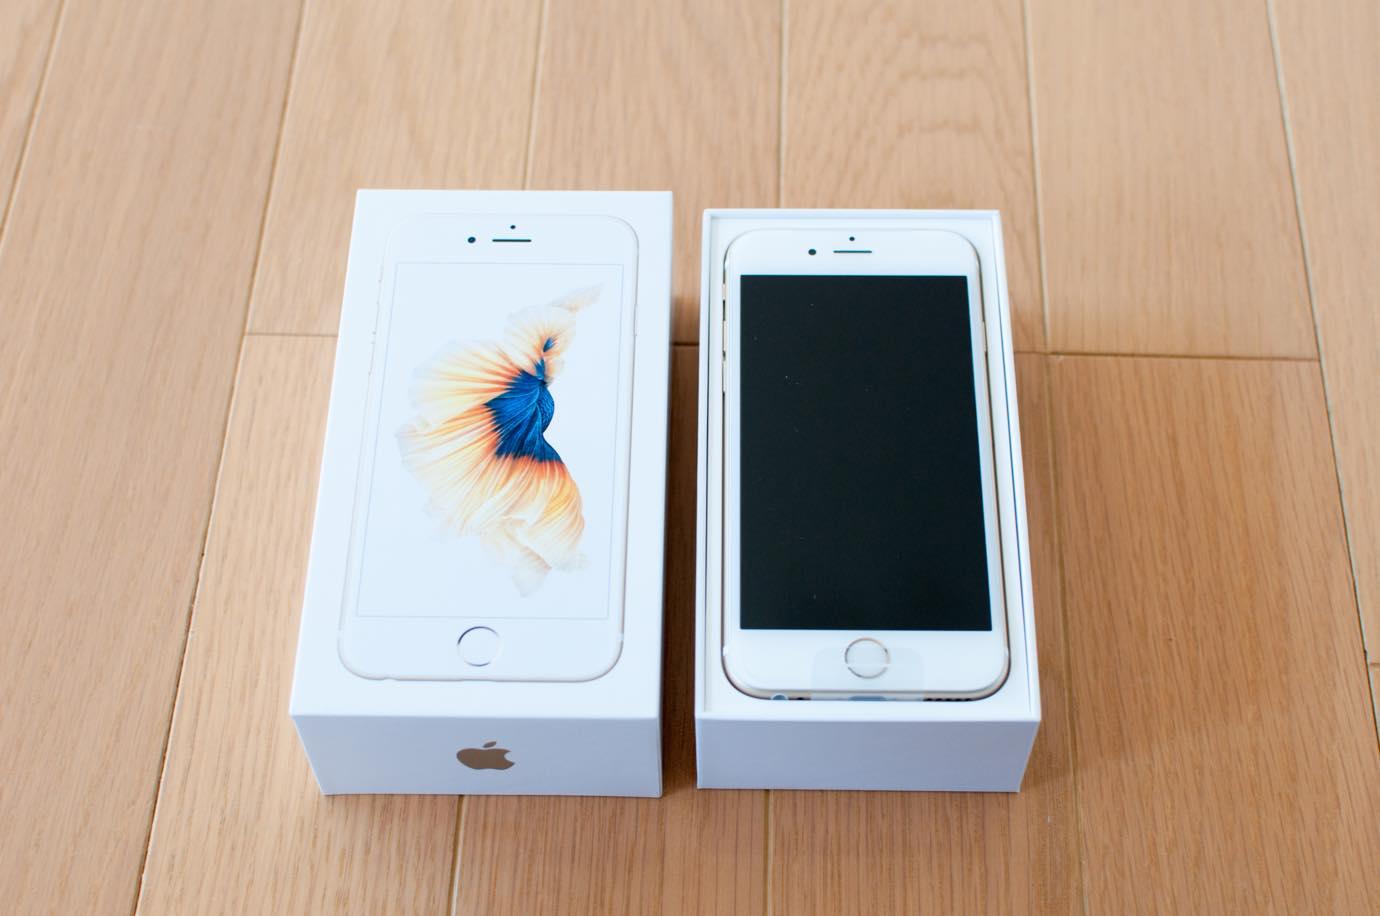 IPhone6s 09 20151005 232049